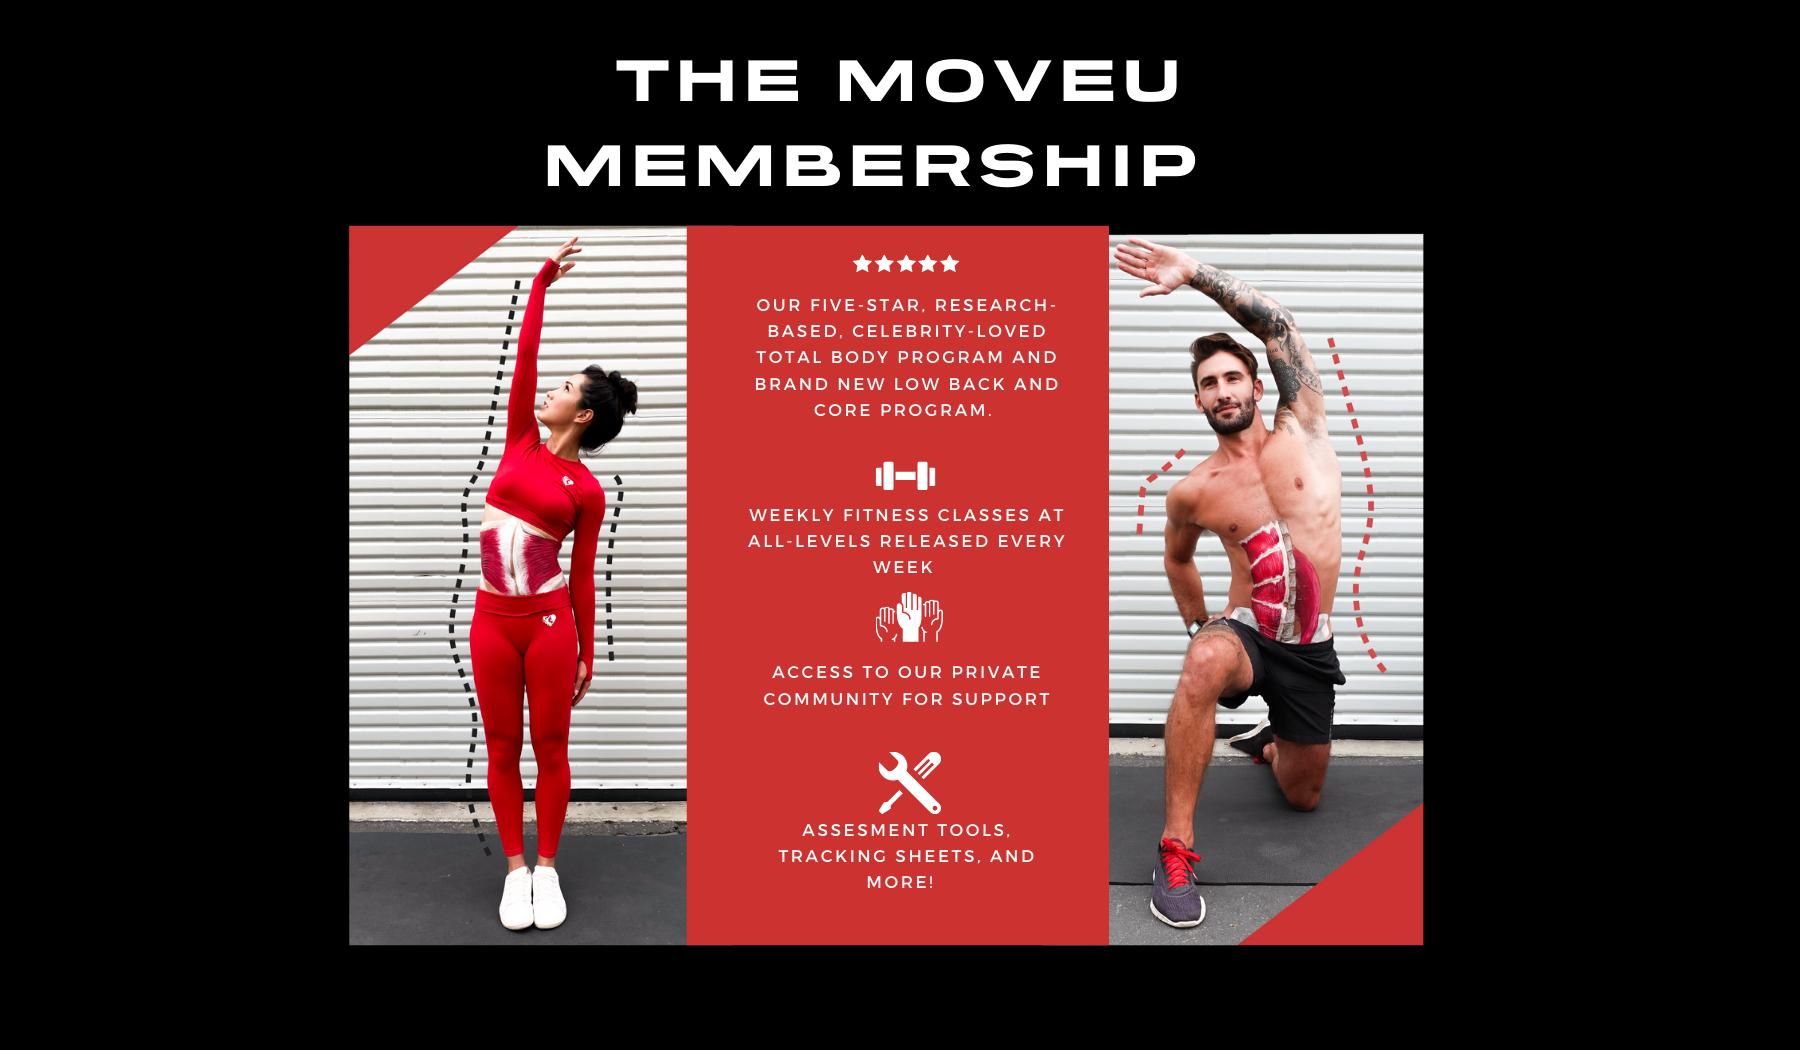 The MoveU Membership